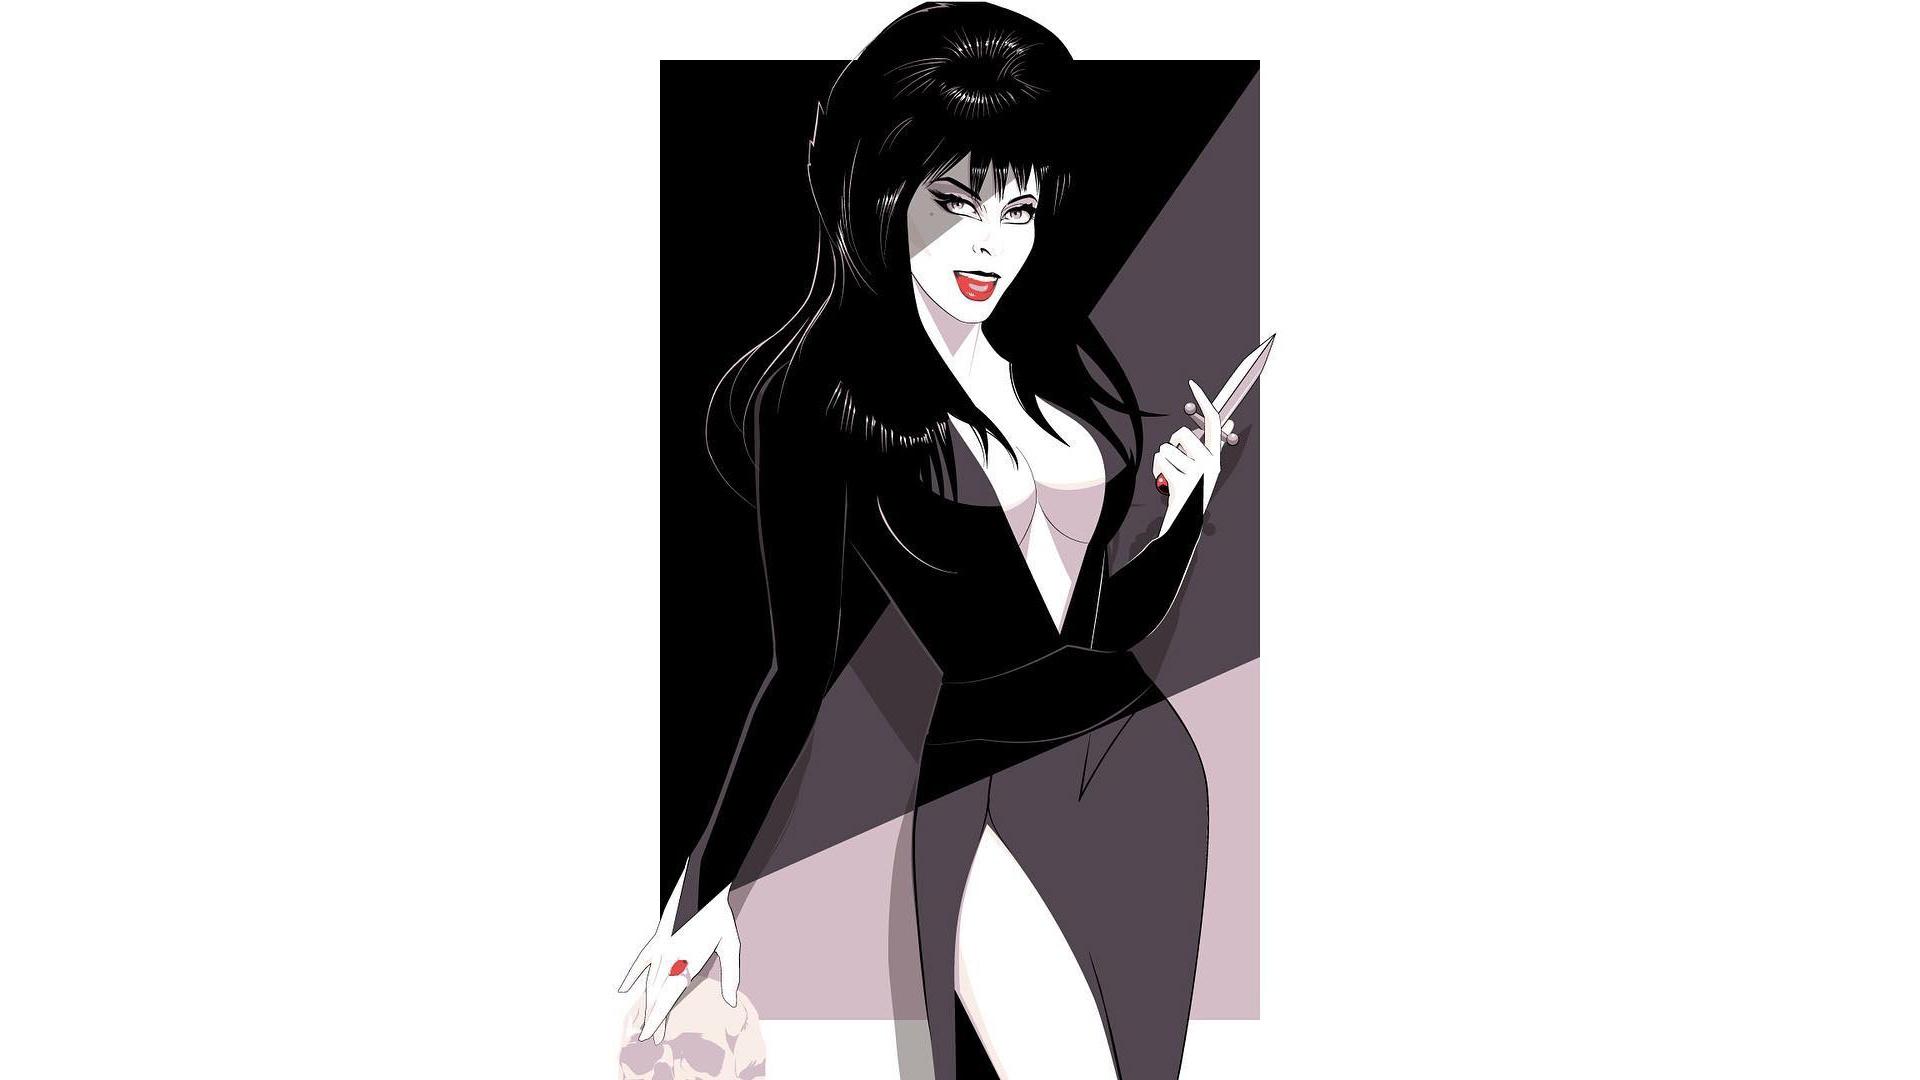 Wallpaper Elvira Mistress Of The Dark Artwork 1920x1080